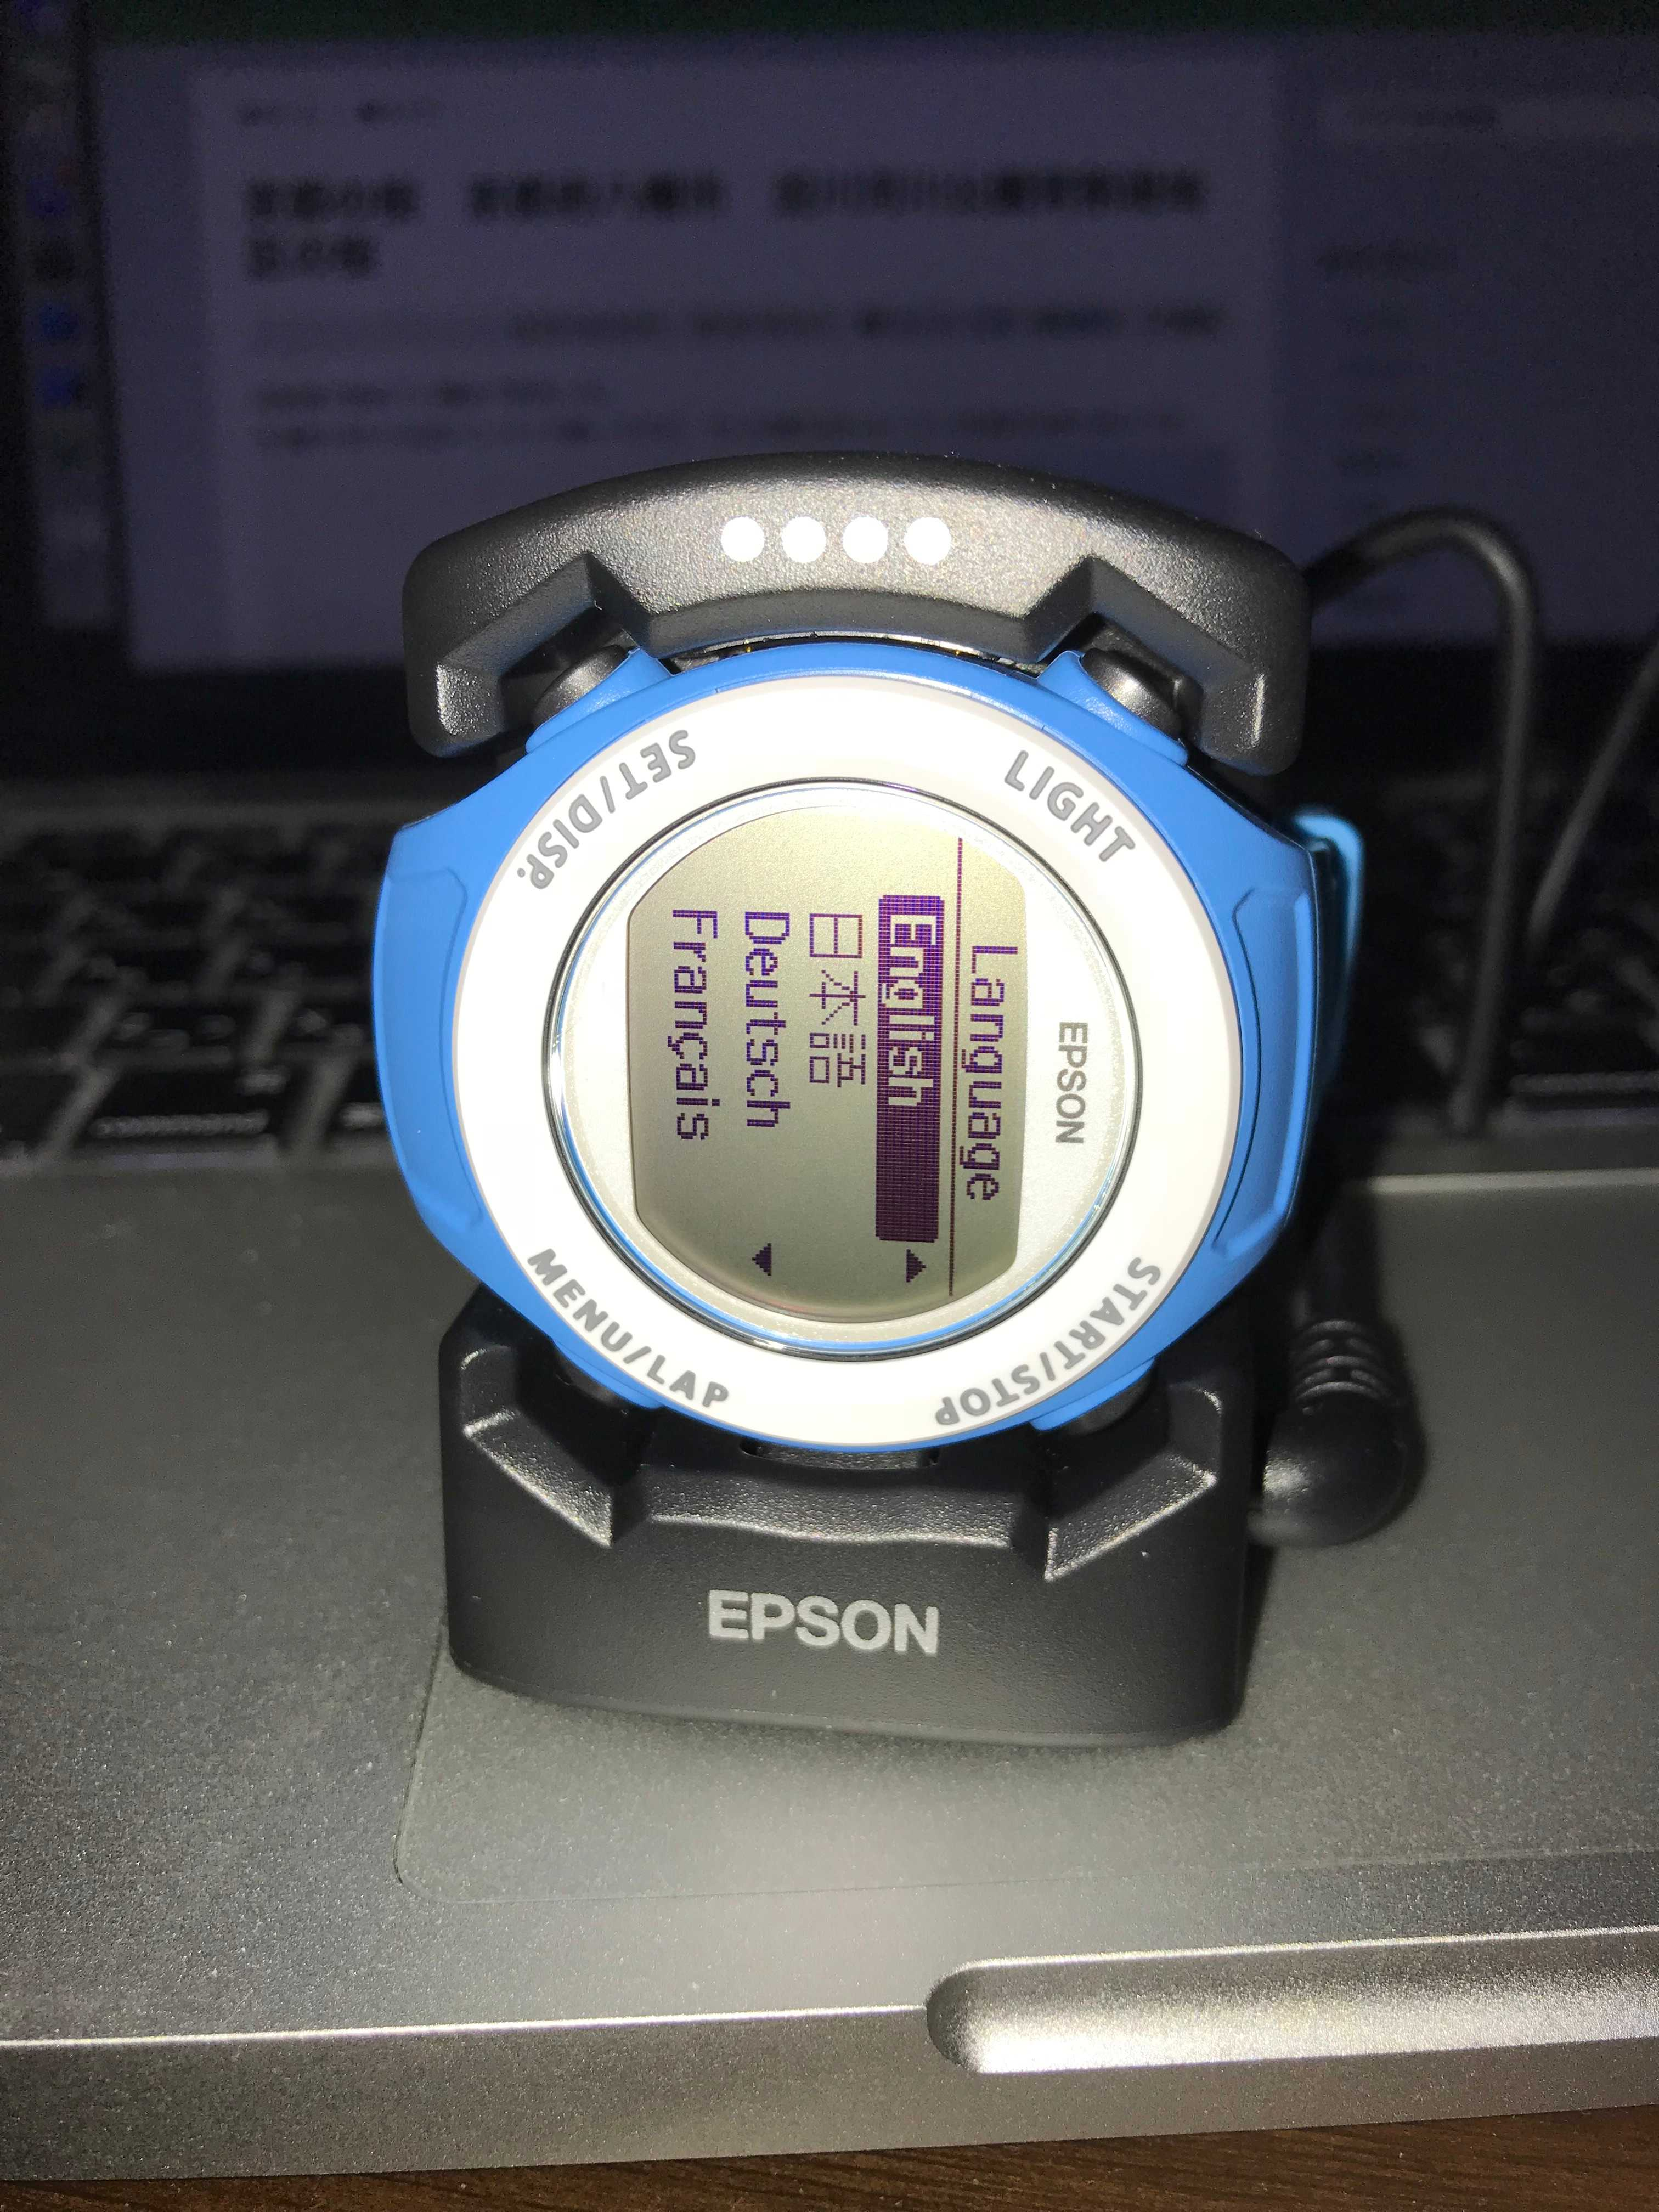 aaabea312f EPSON GPS腕時計 SF-110Cを買いました。